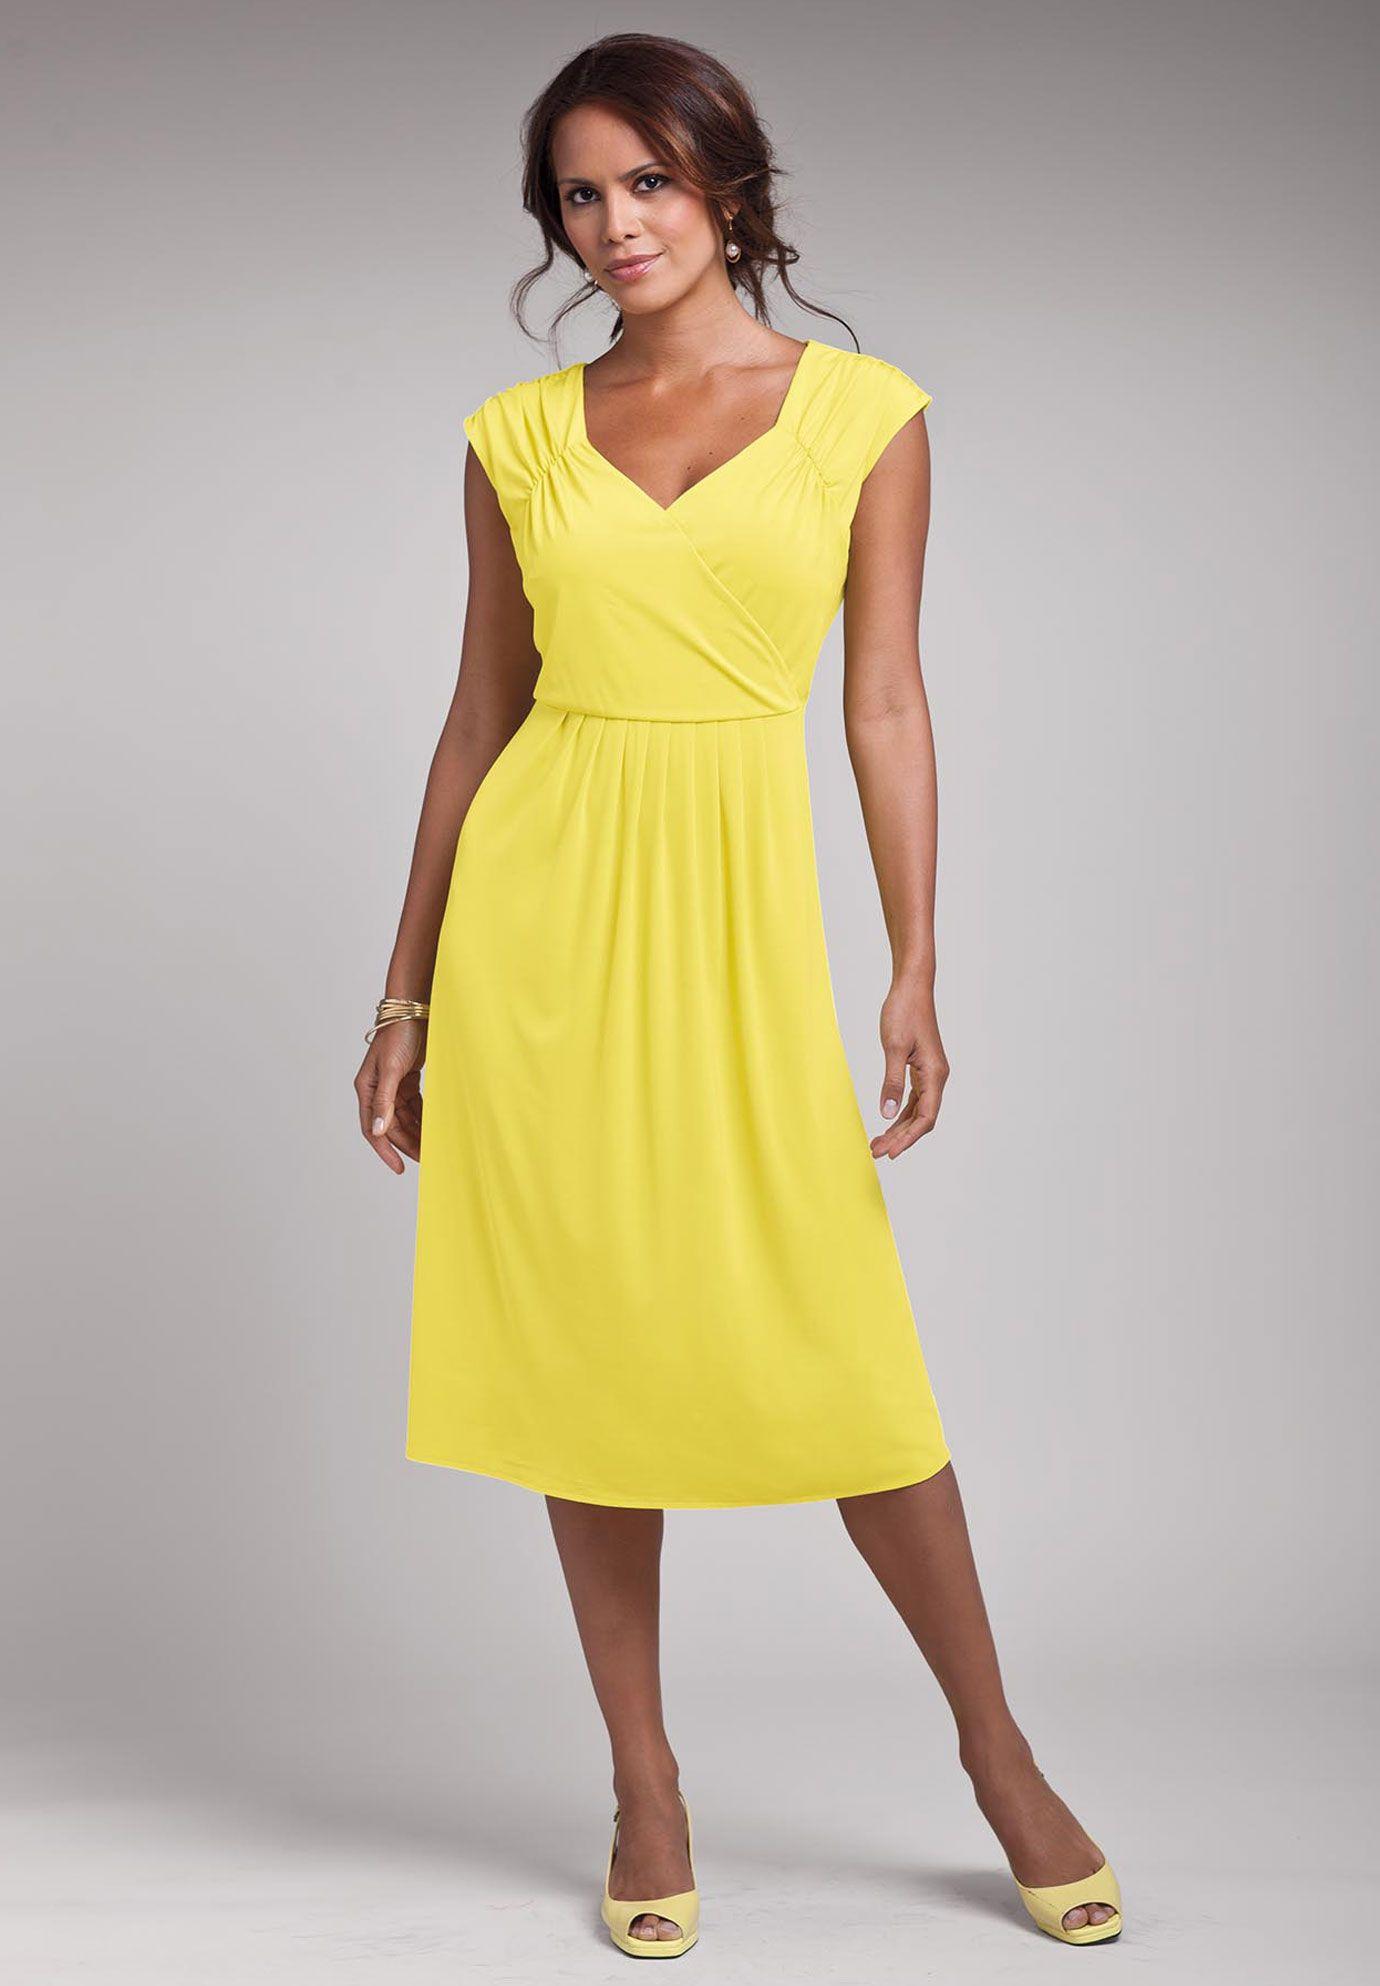 Plus Size Solid Empire Waist Dress Plus Size Casual Work